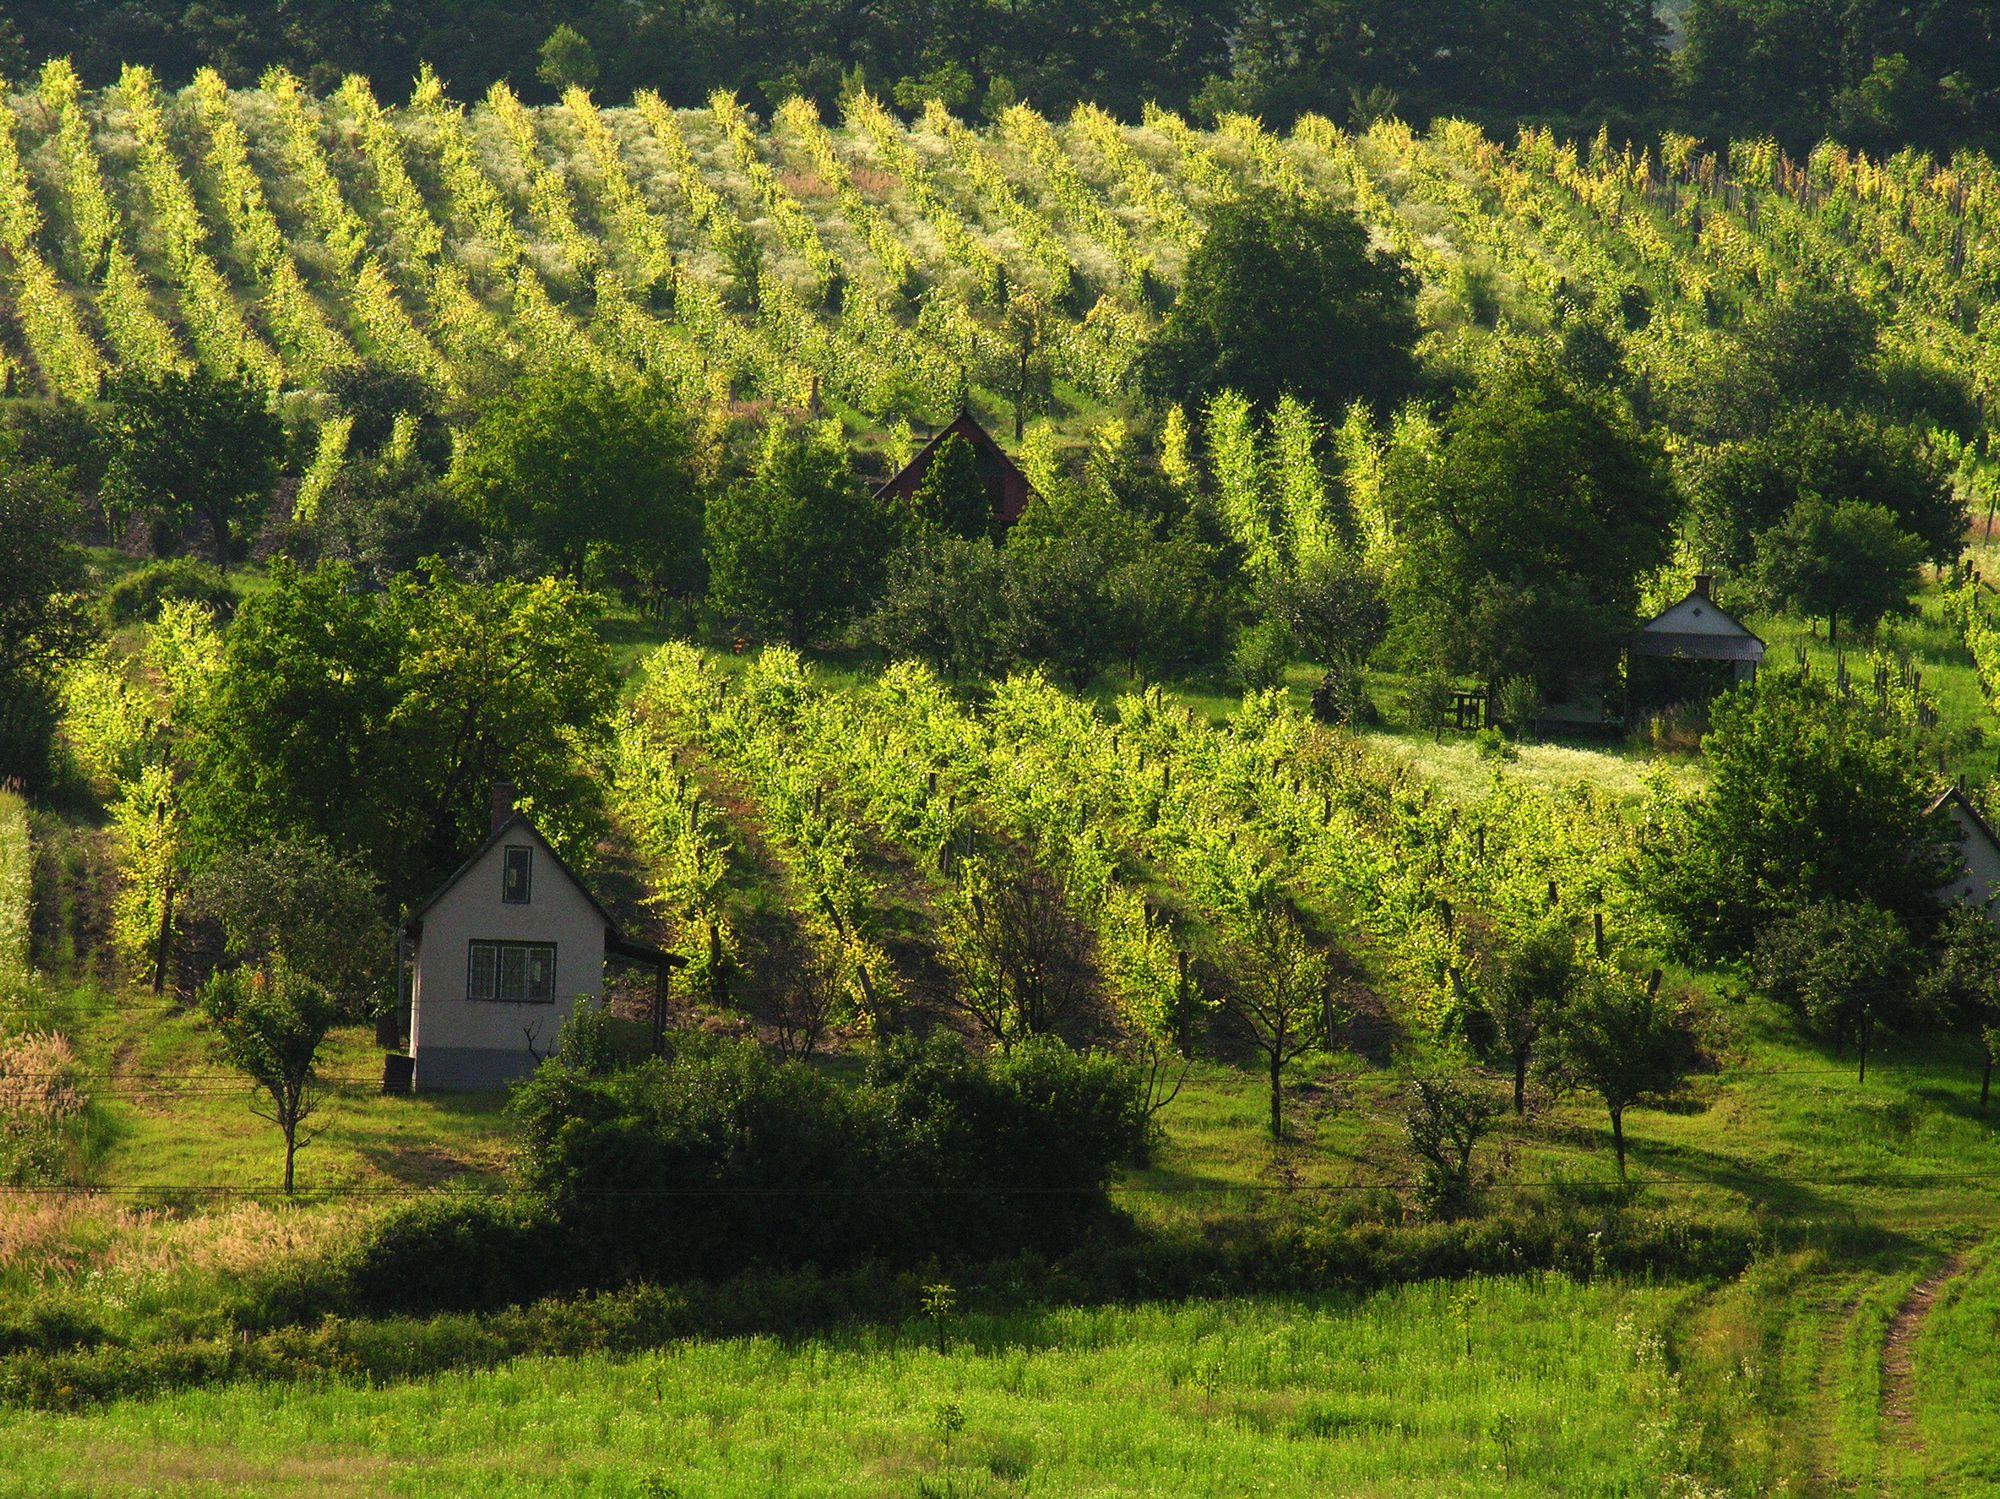 Hungary, near Eger, vineyard